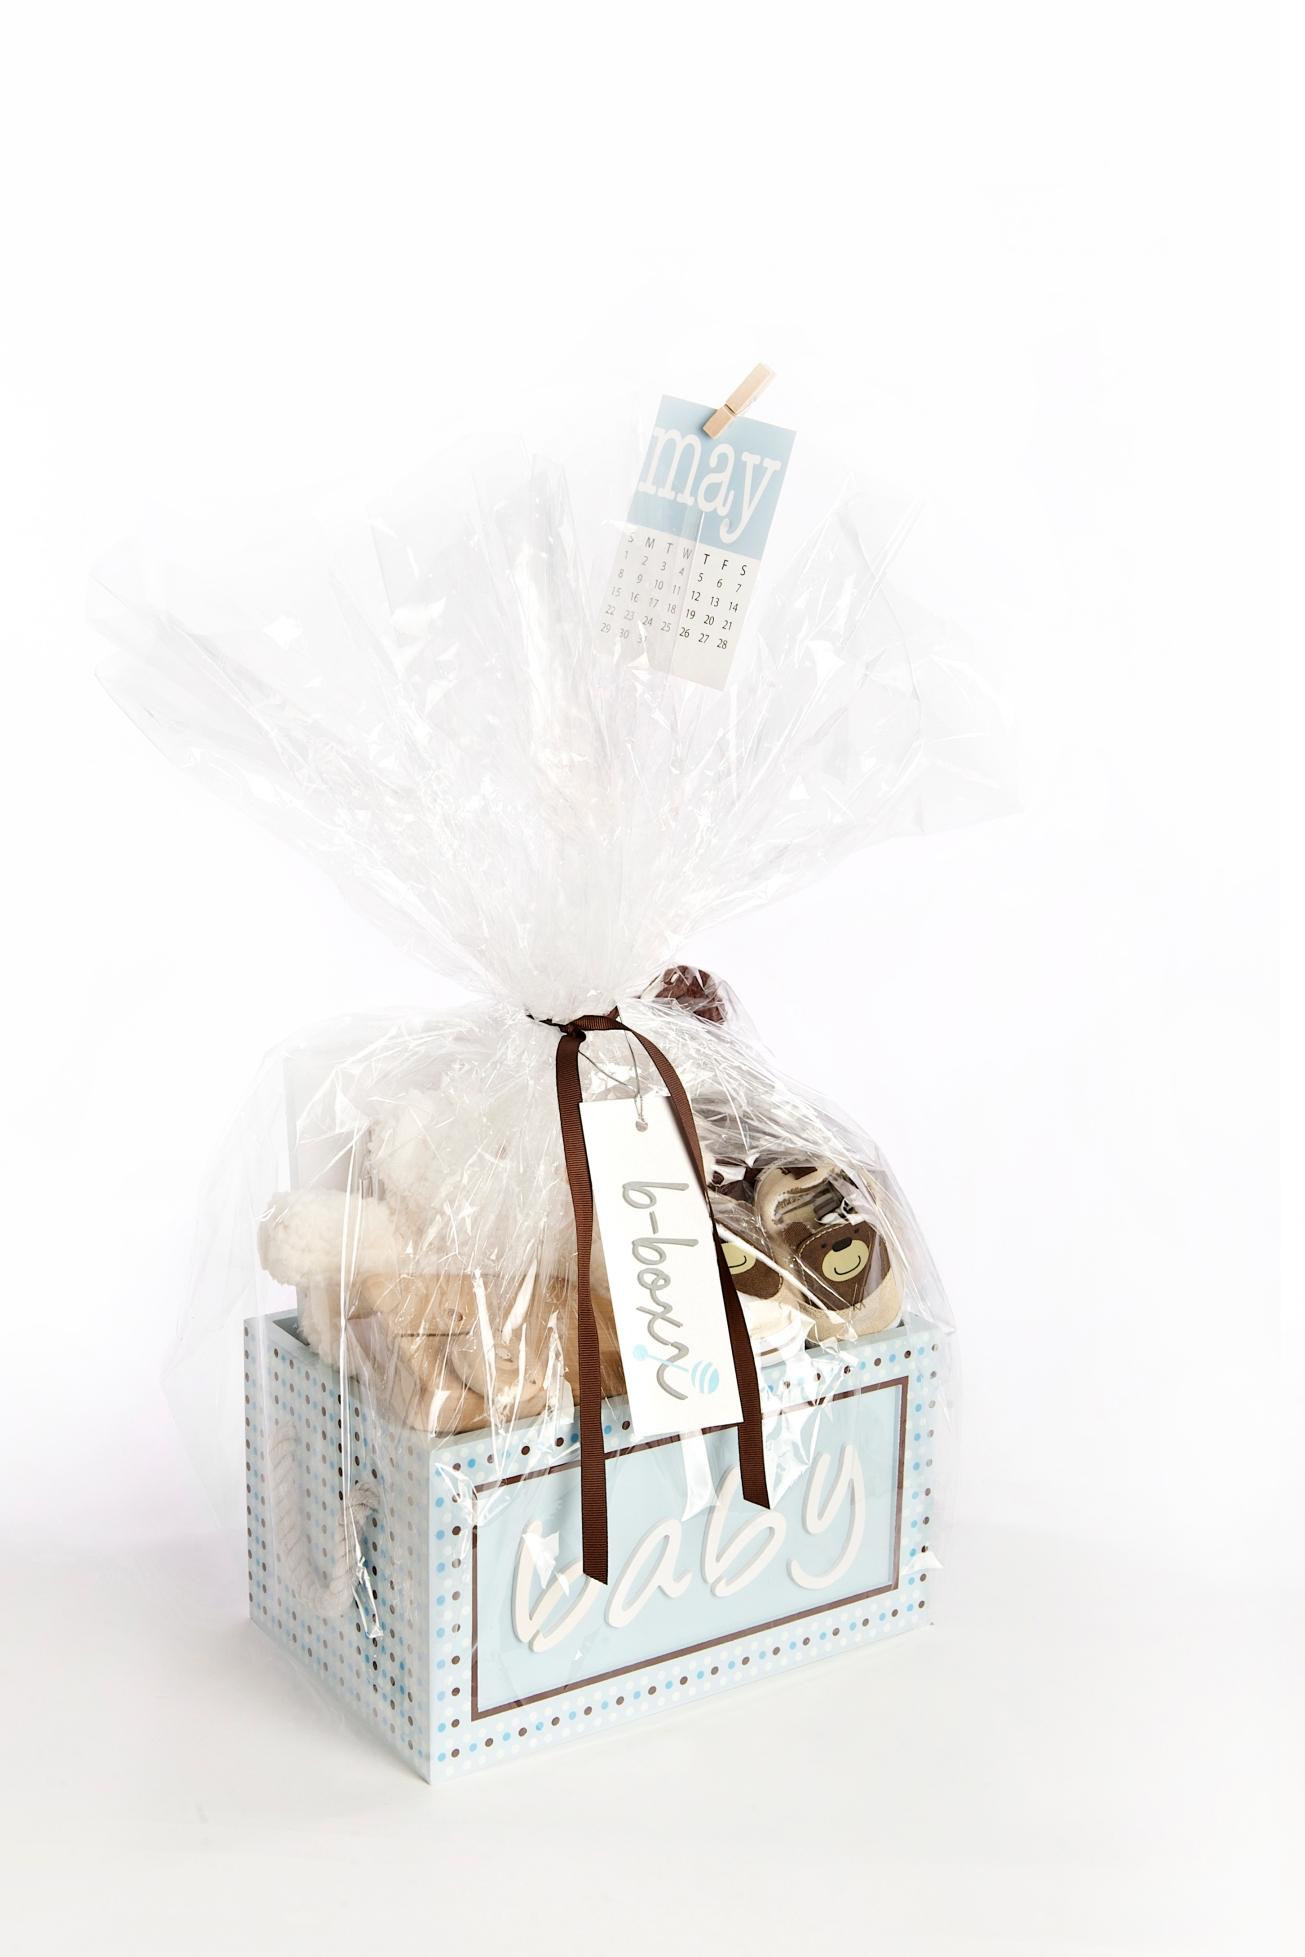 B-Boxx builds visual identity to market custom baby shower gifts ...